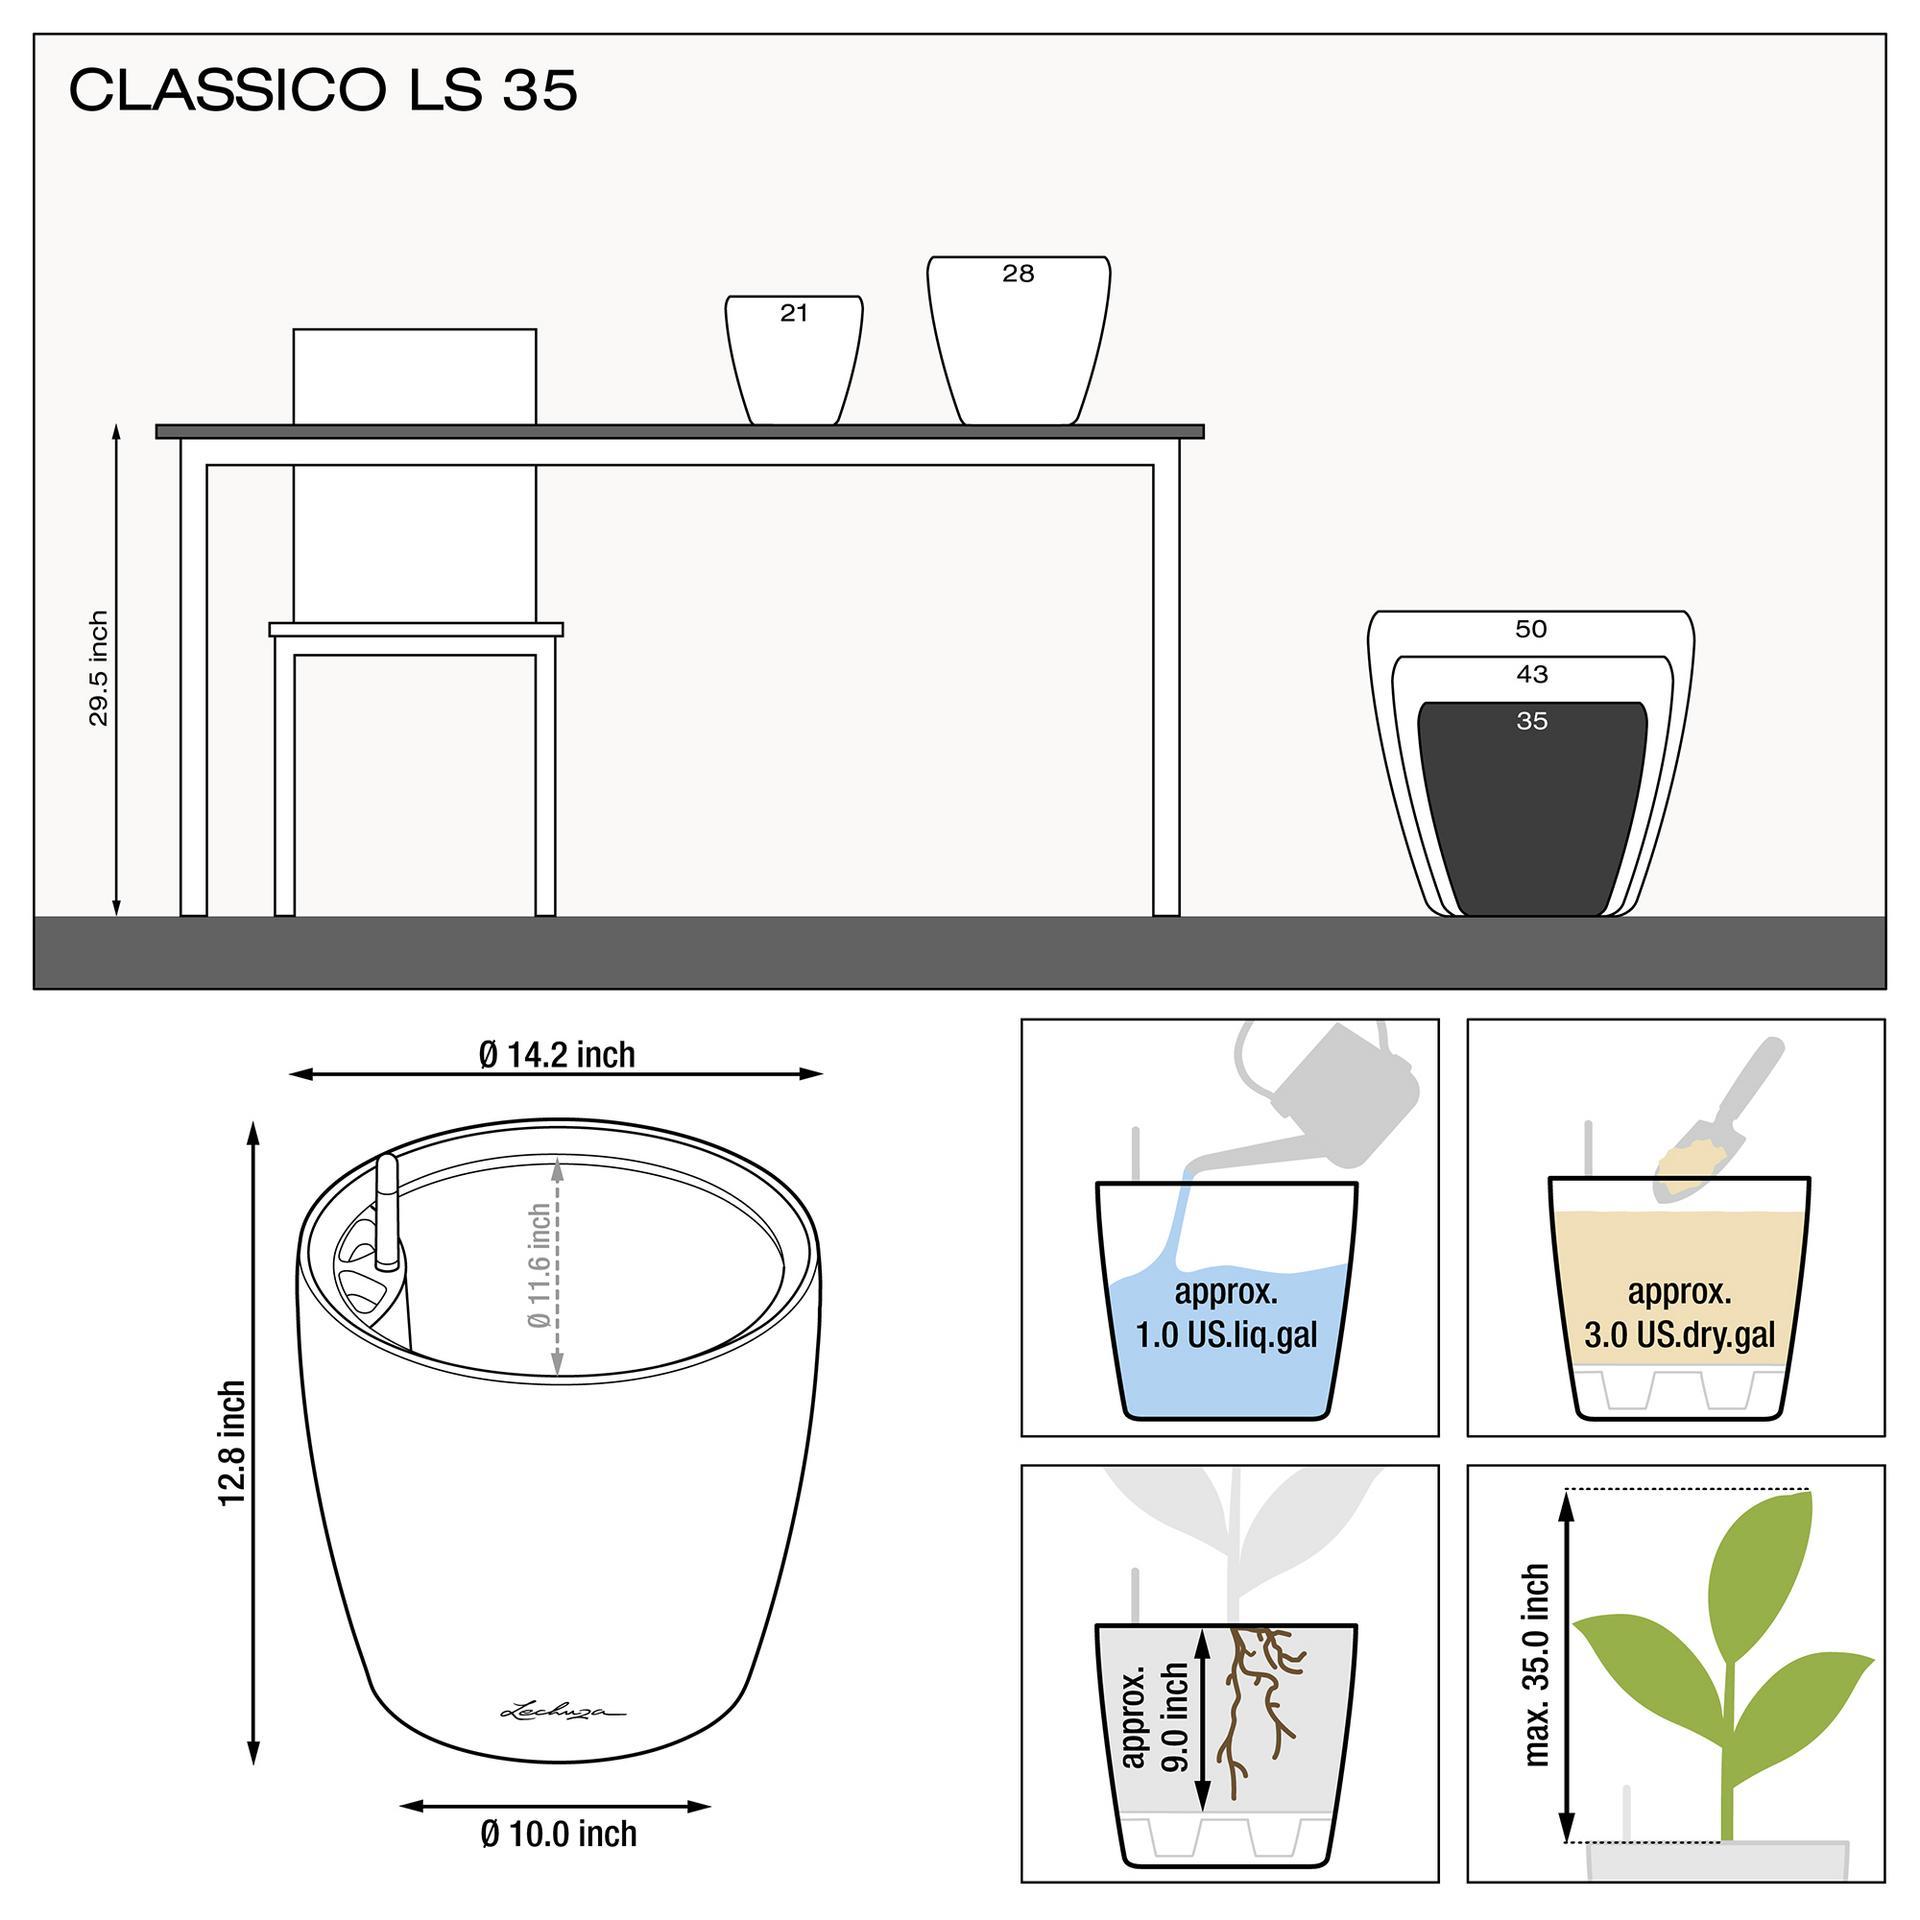 le_classico-ls35_product_addi_nz_us